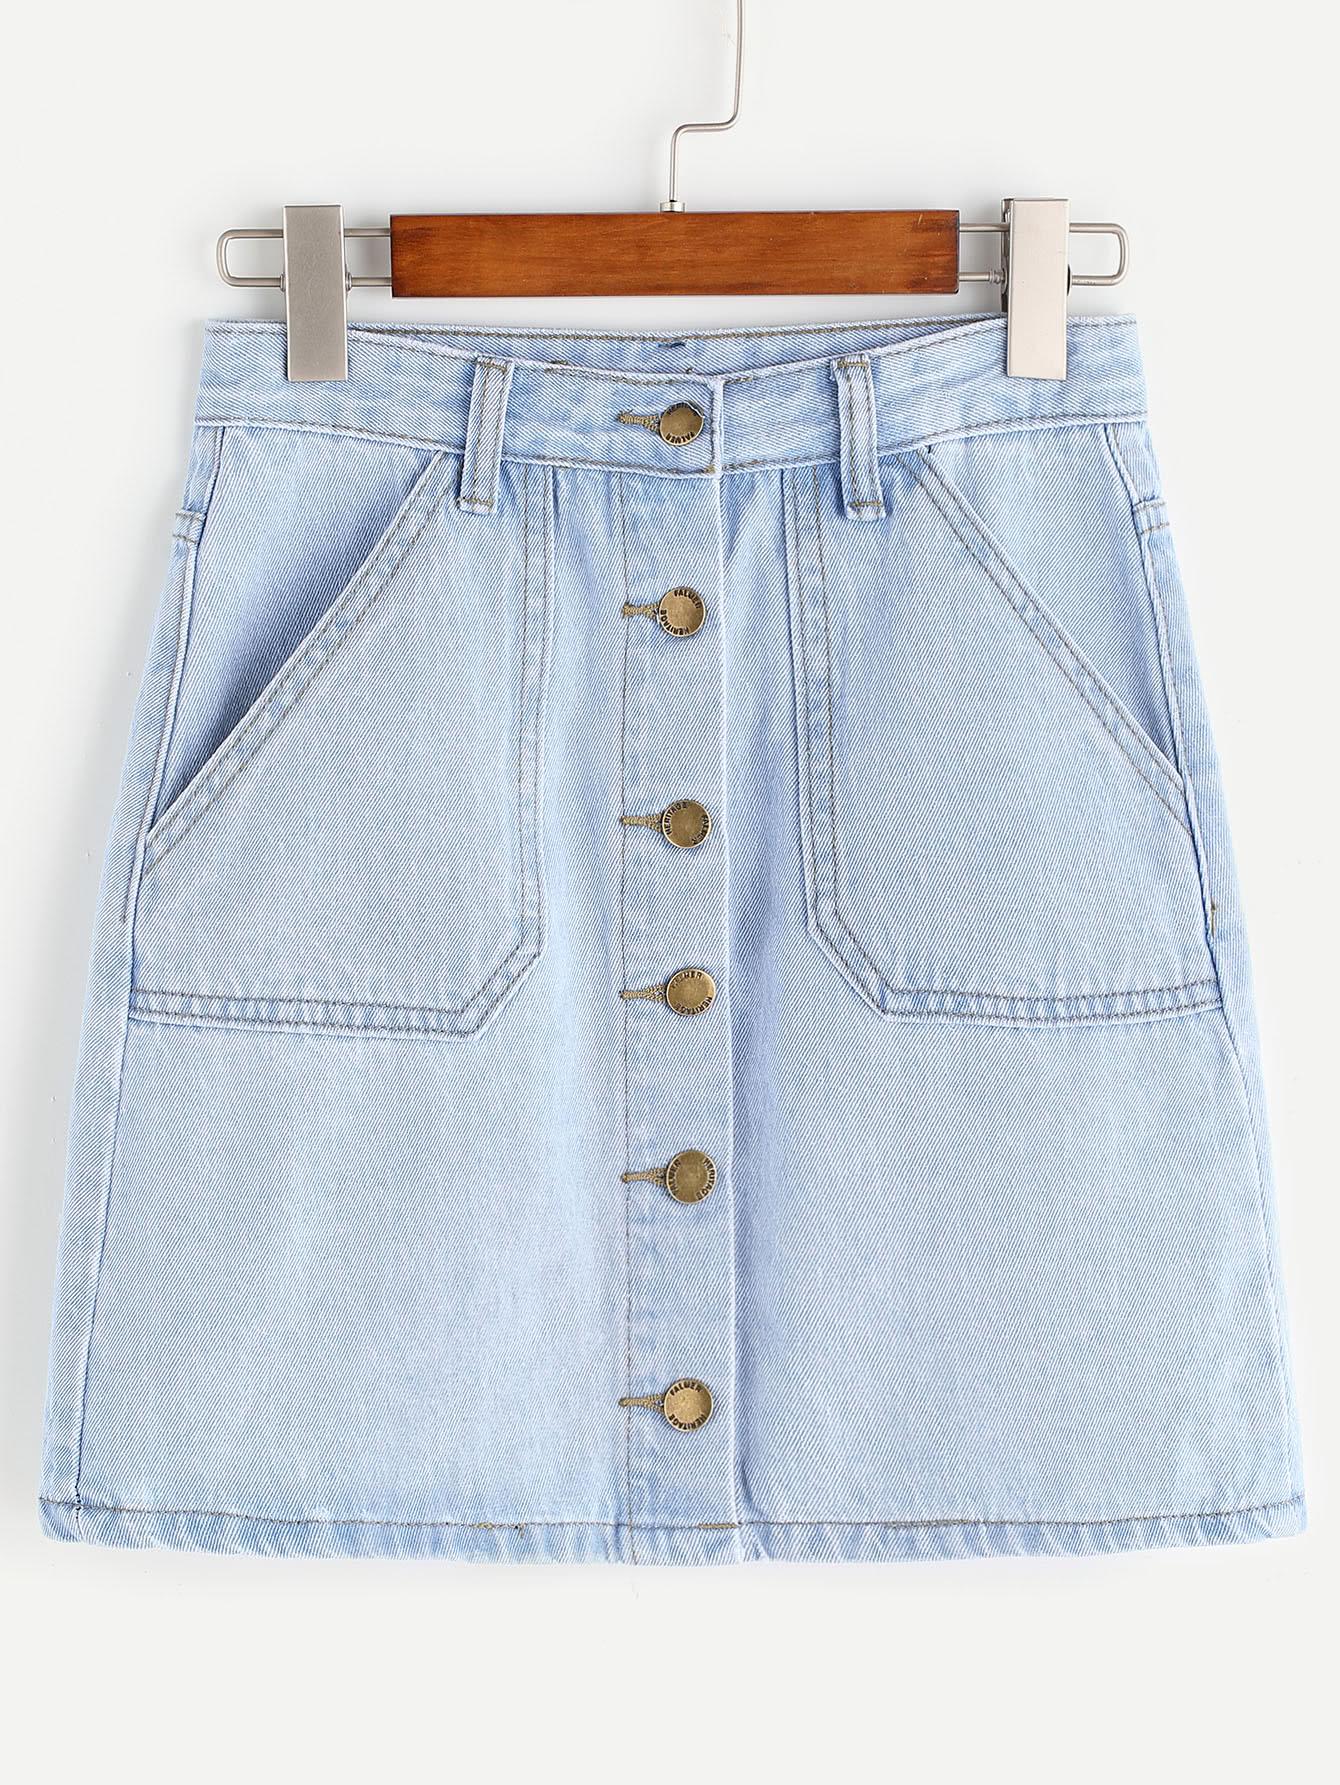 Single Breasted Pockets Denim Skirt